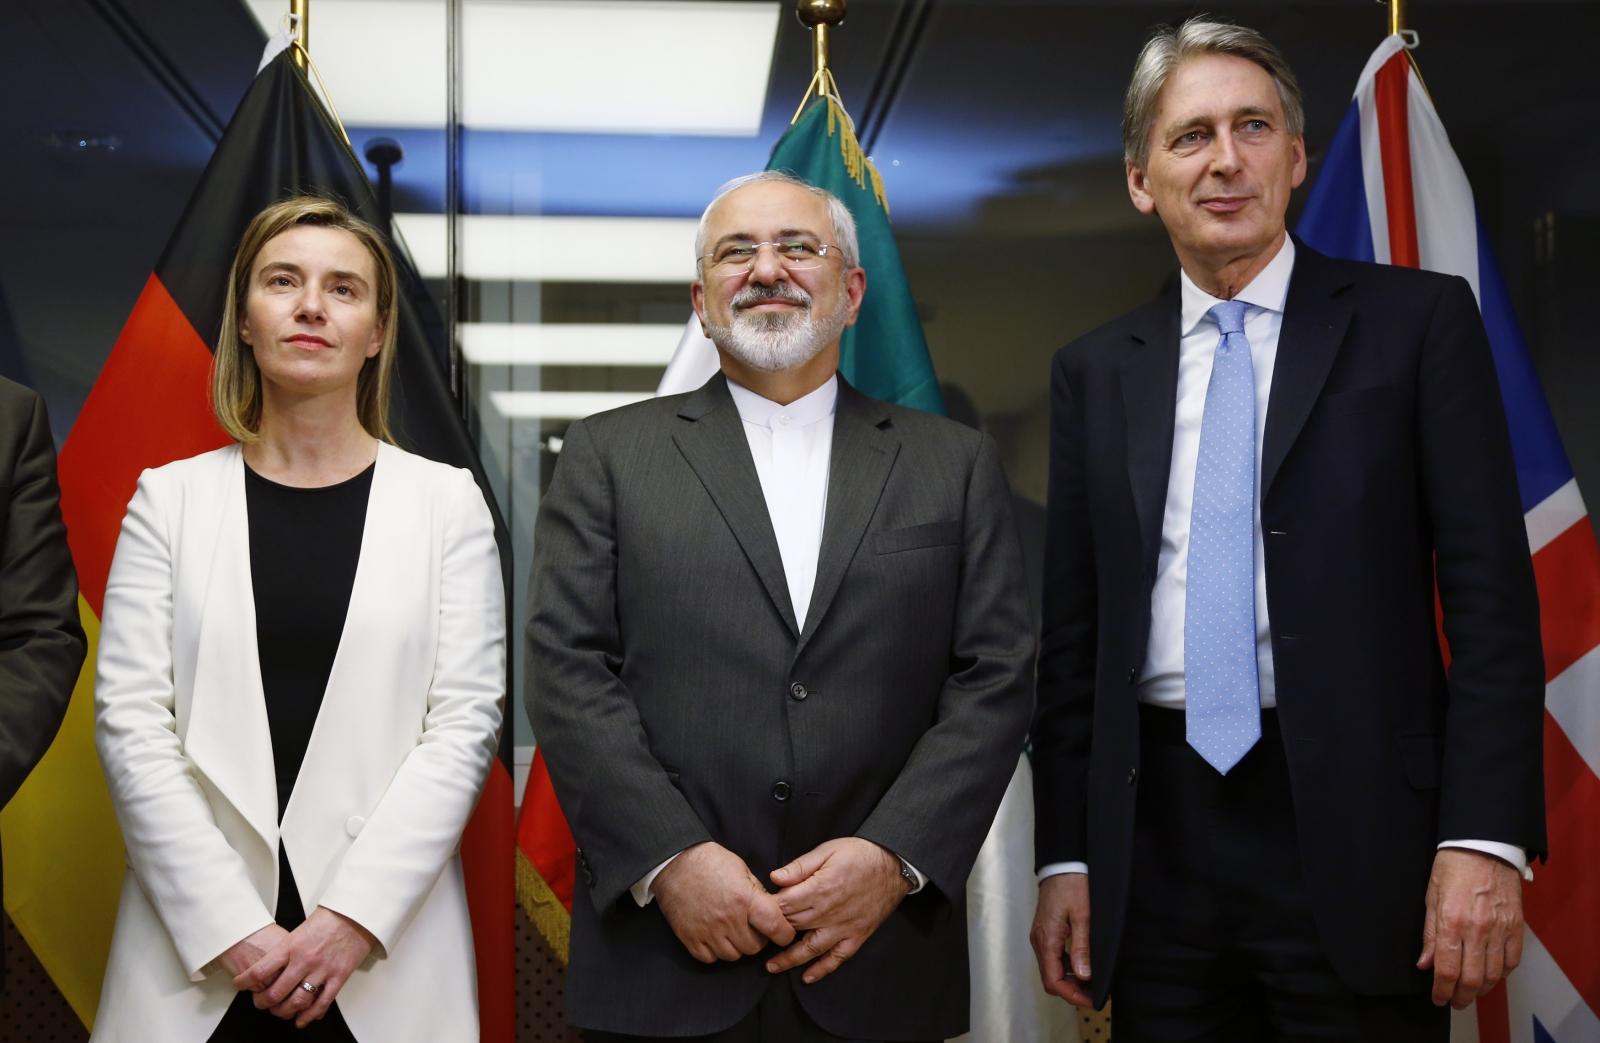 Hammond Iran Yemen hostage